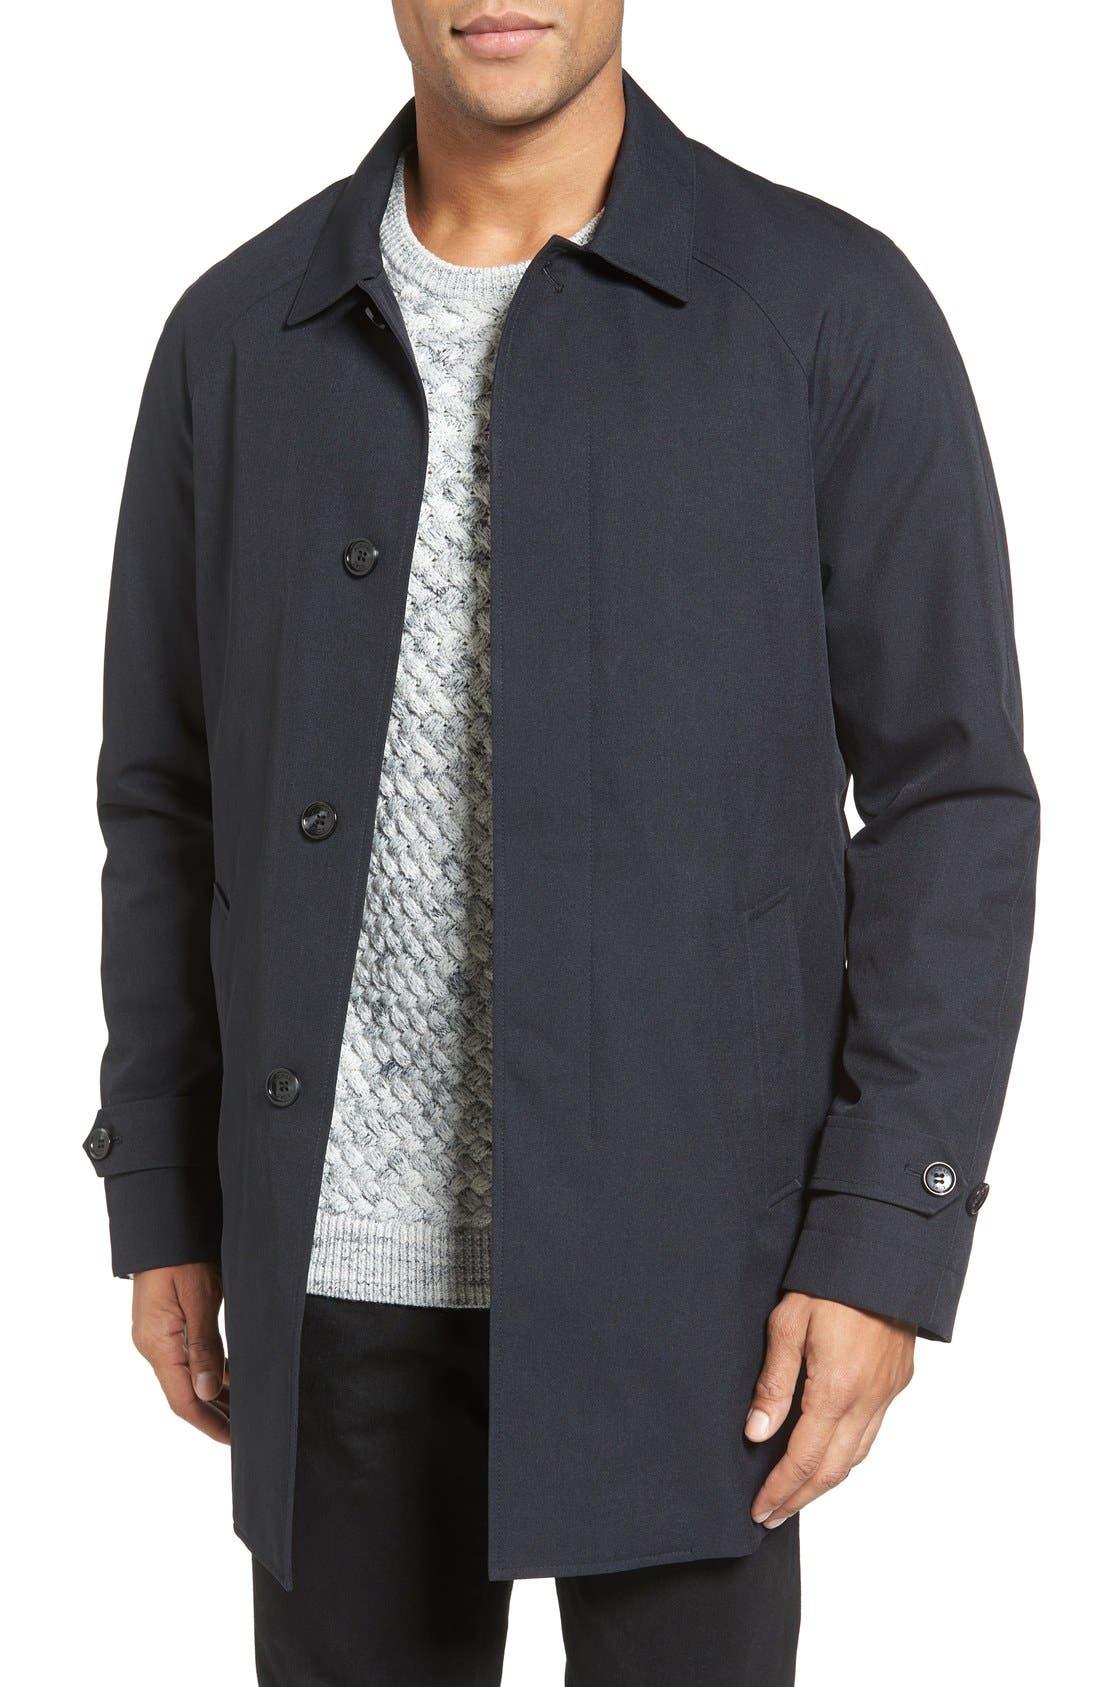 Main Image - Michael Kors Waterproof Jacket